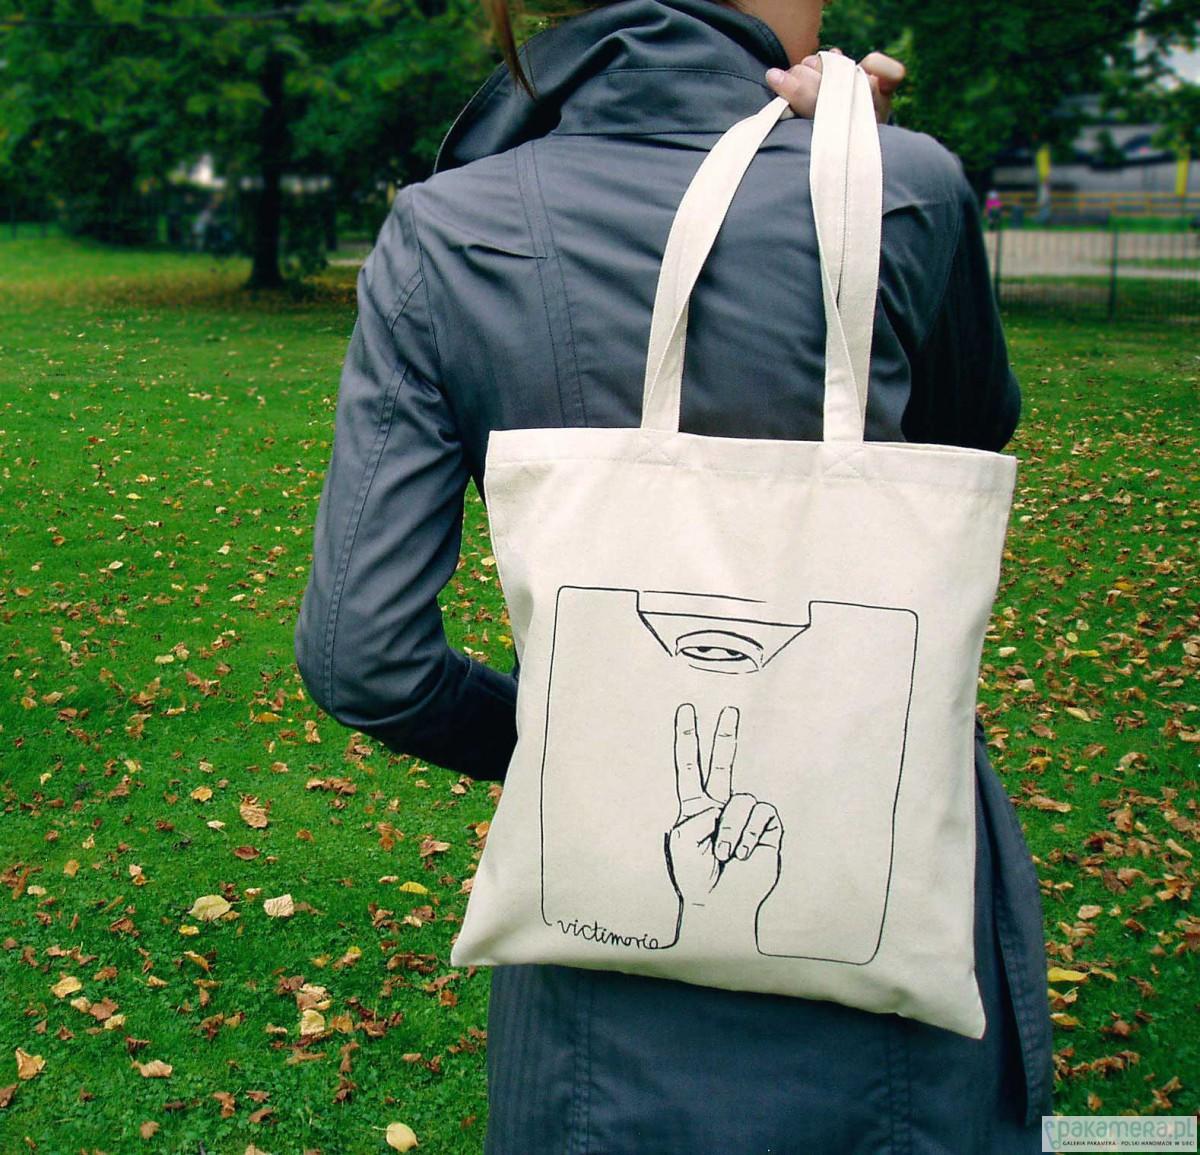 e283f70e27354 Eko torba na zakupy bawełna - Victimorio - ecru - torby na zakupy - damskie  - Pakamera.pl